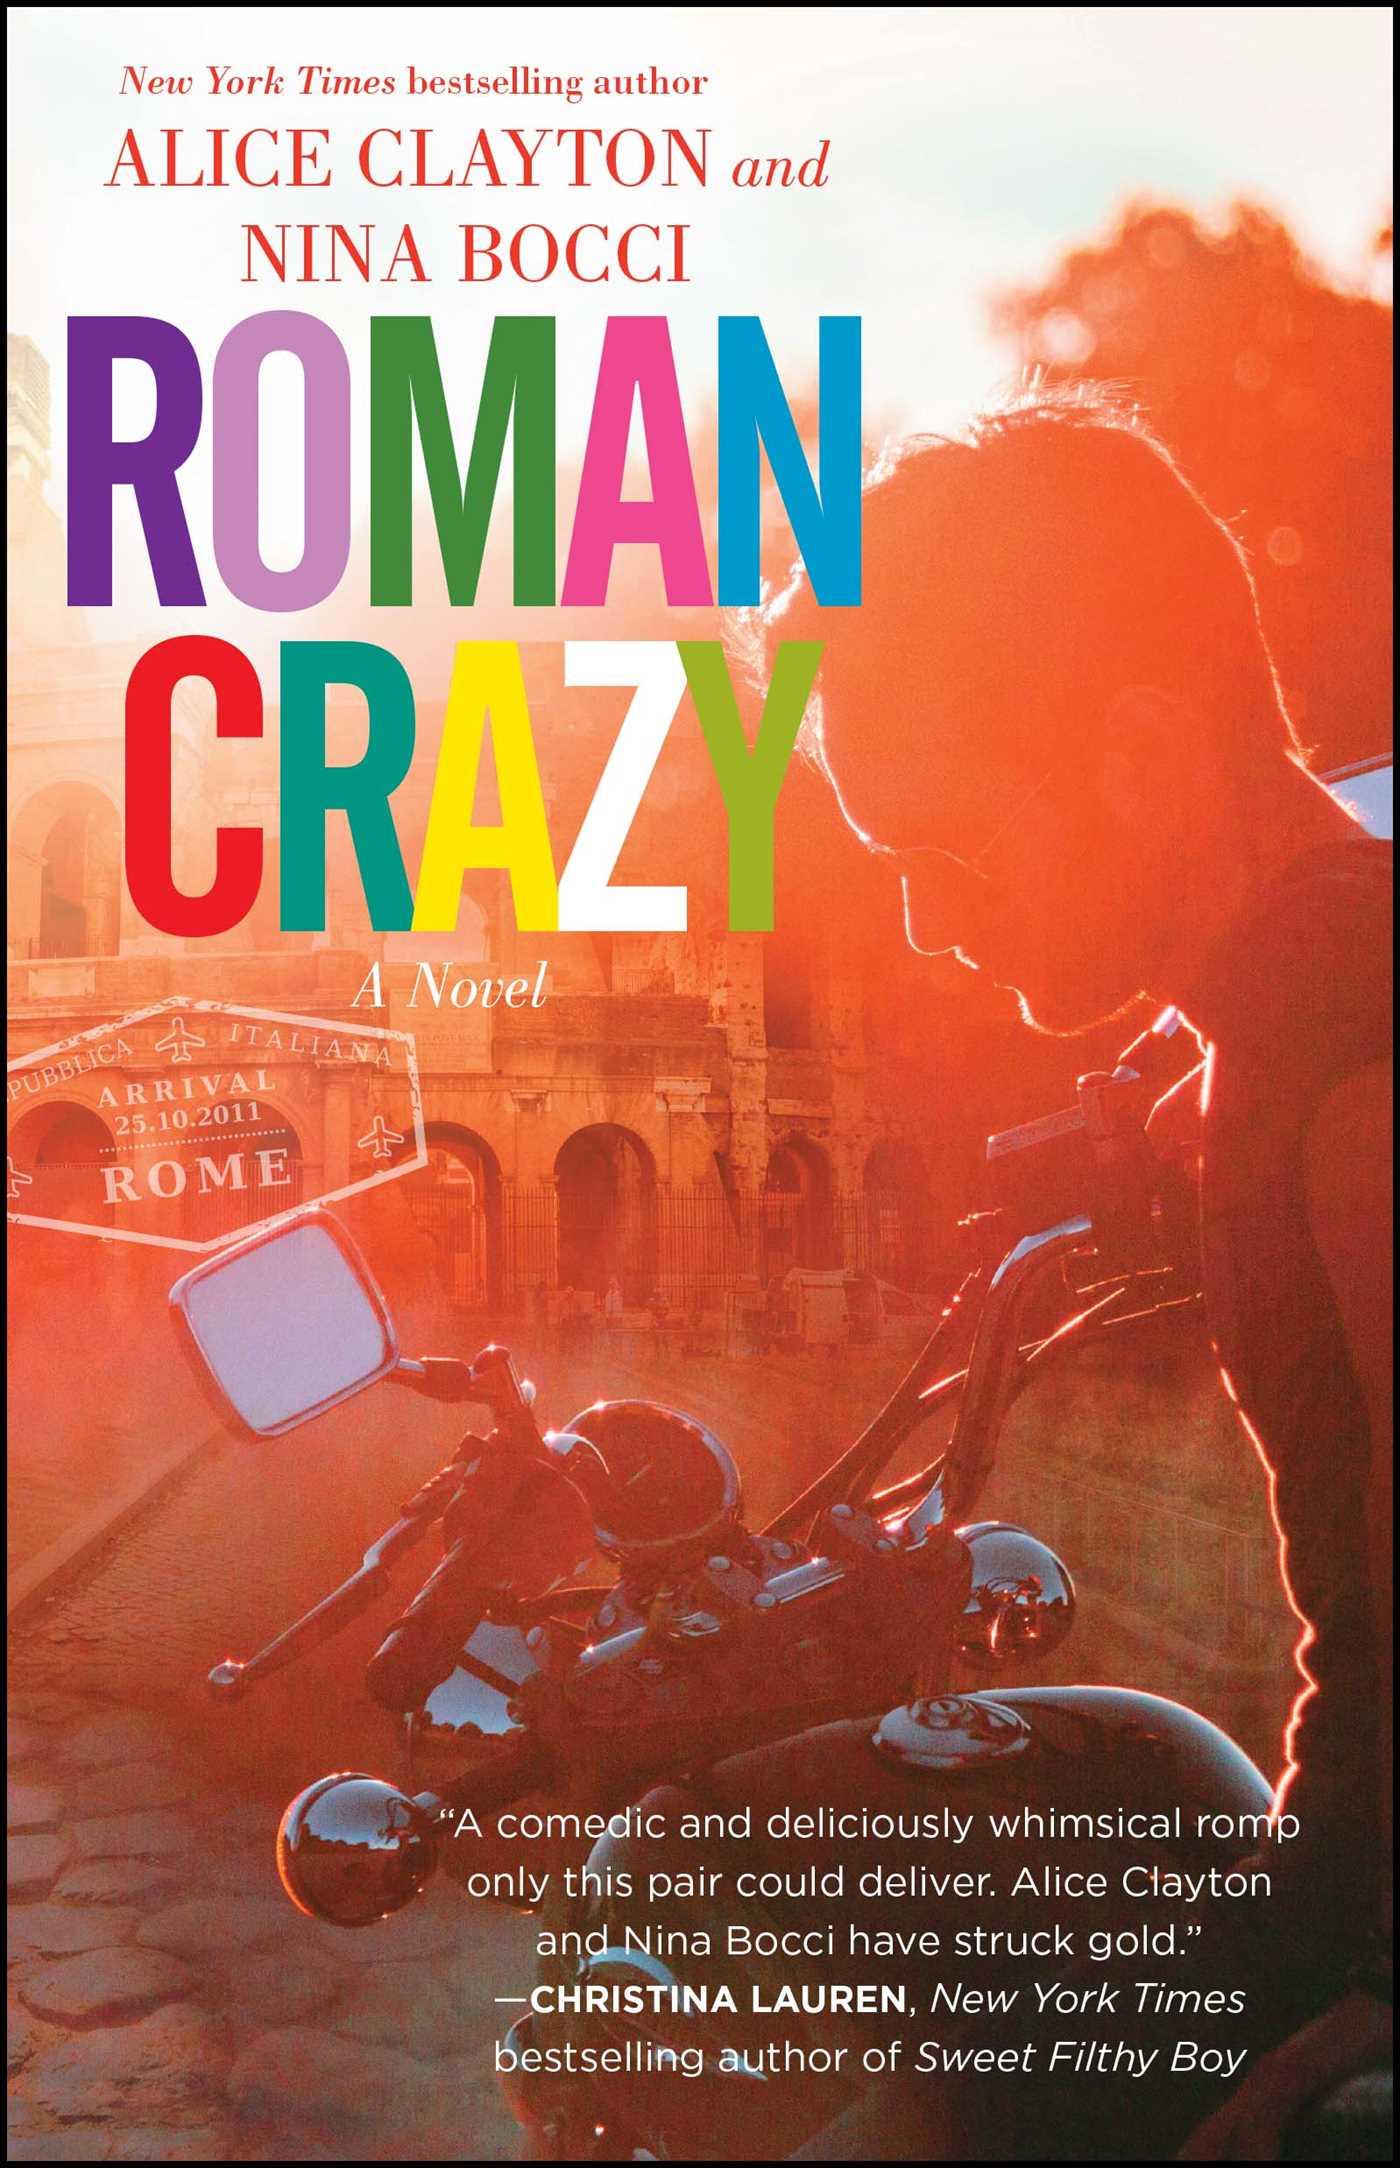 Roman crazy 9781501117633 hr